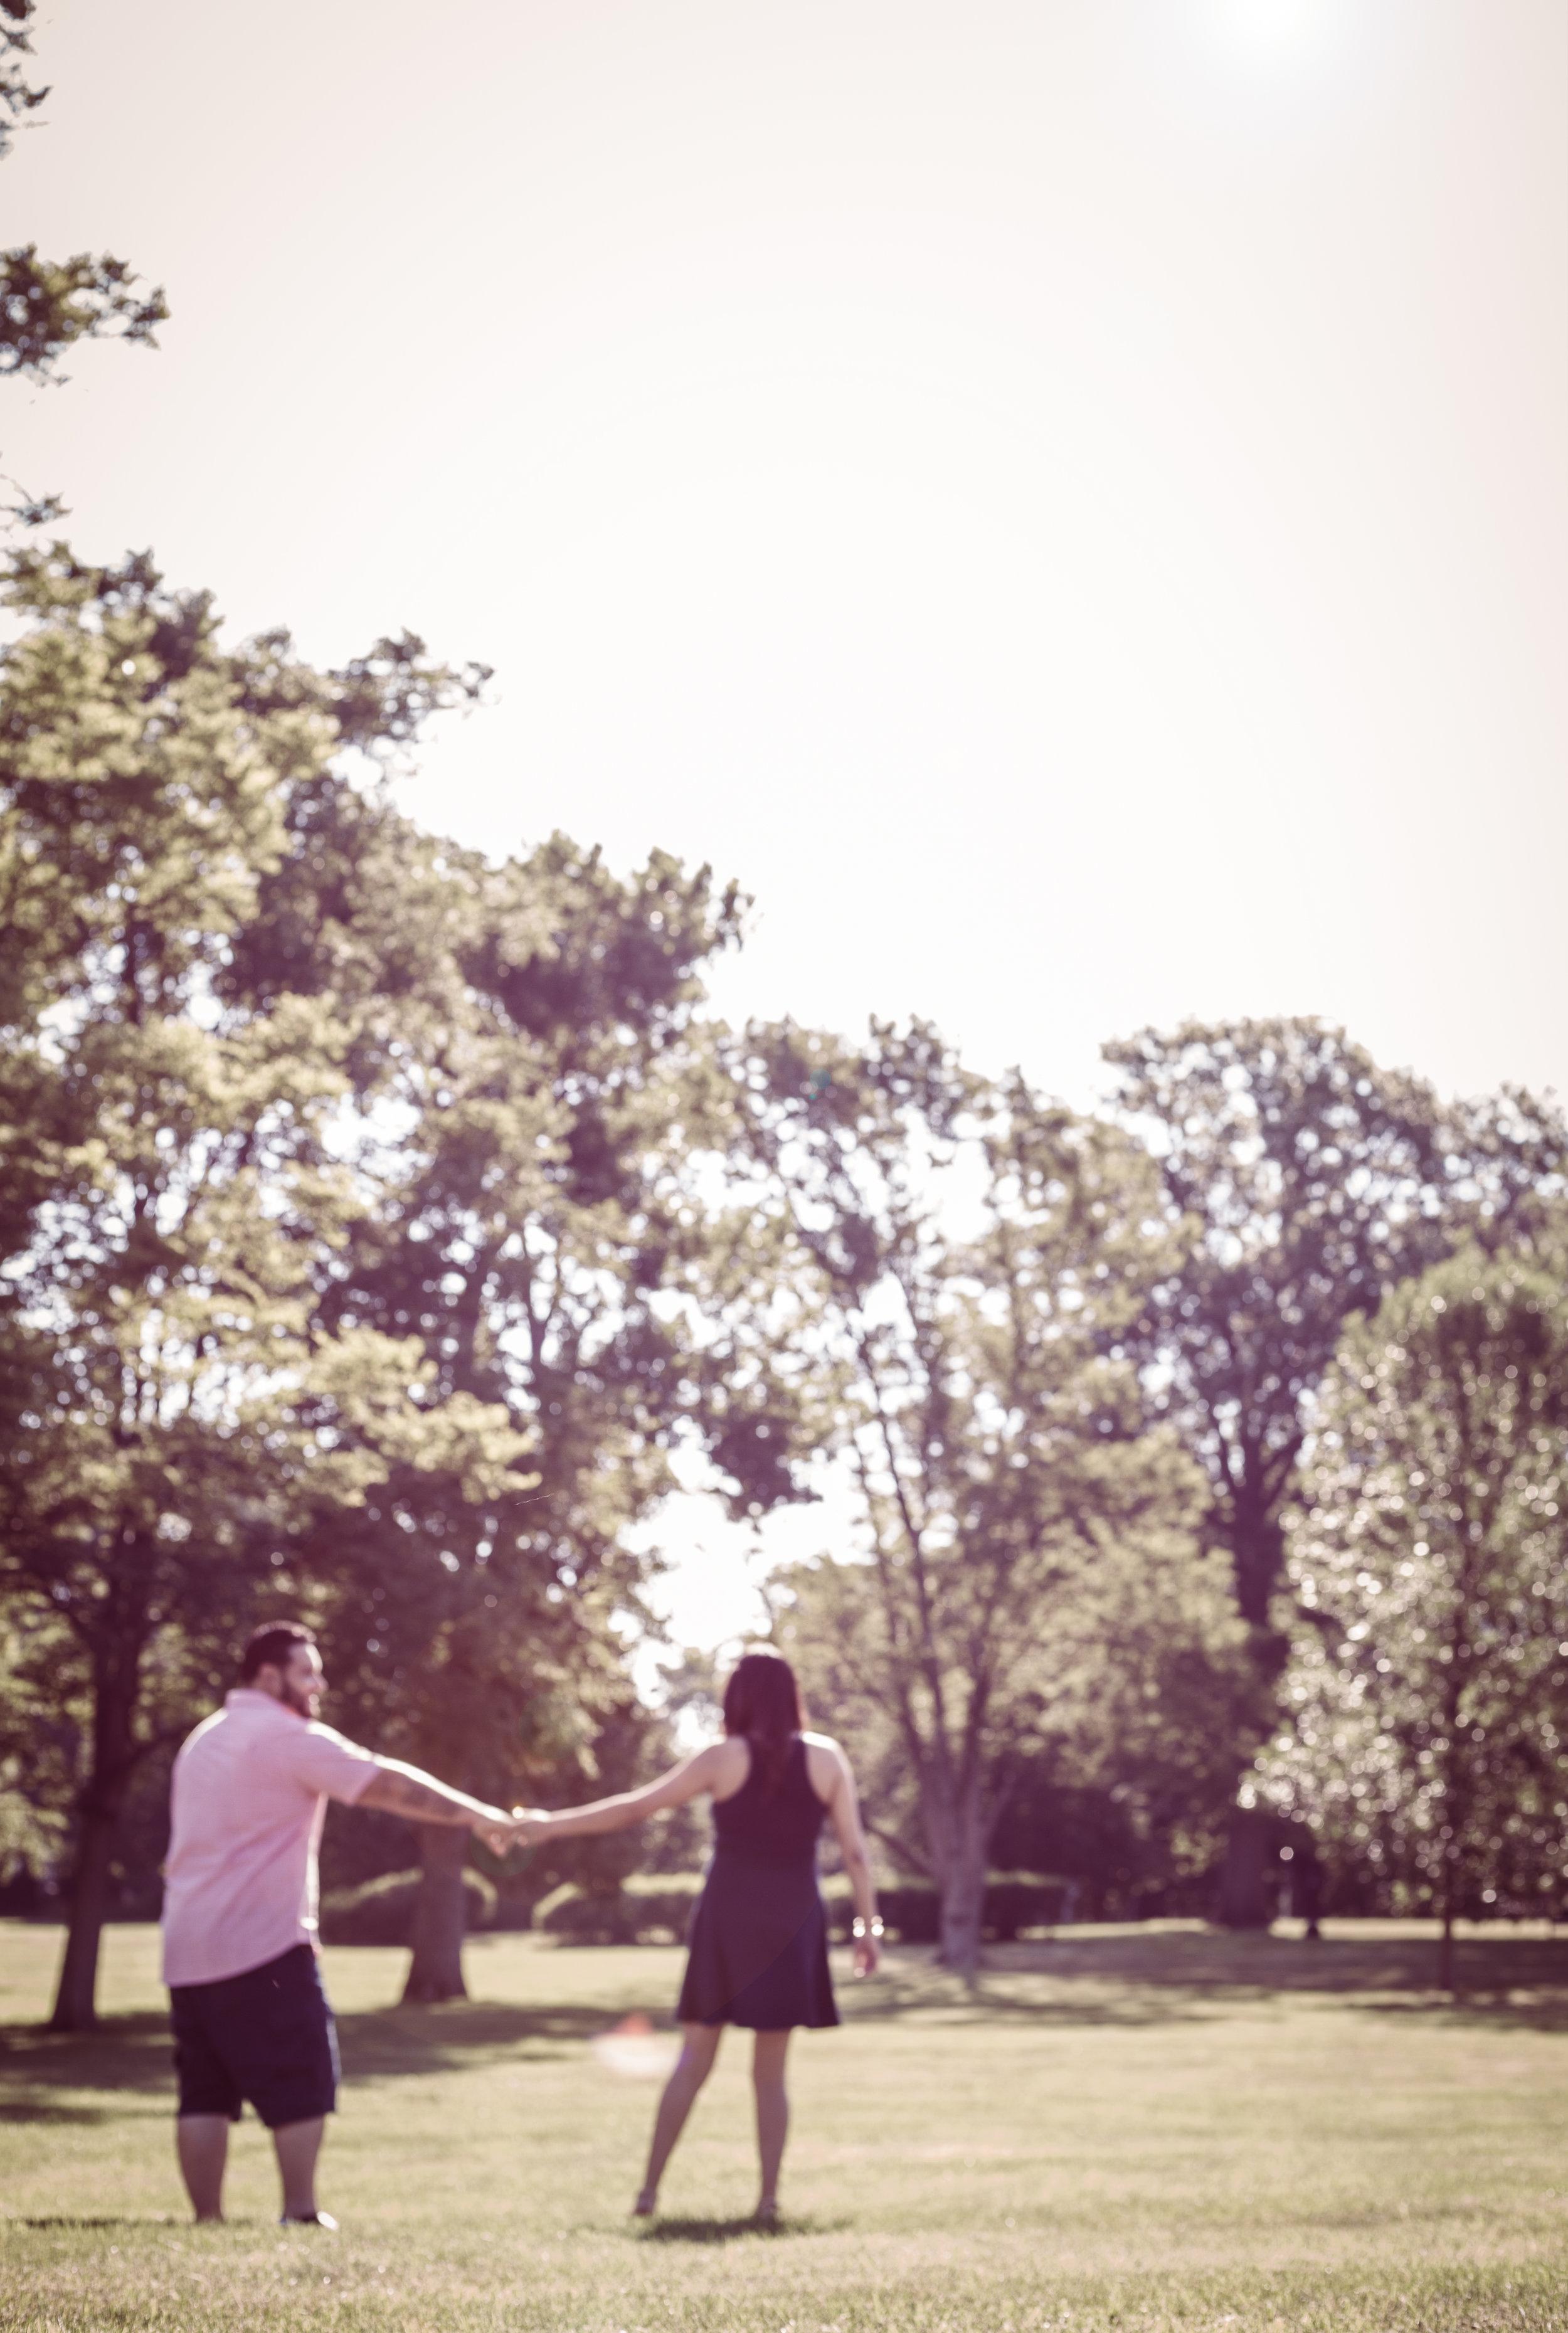 julieta joshua ramos engagement session mini photos photographs photographer kansas city missouri kansas destination wedding photographers (18 of 40).jpg